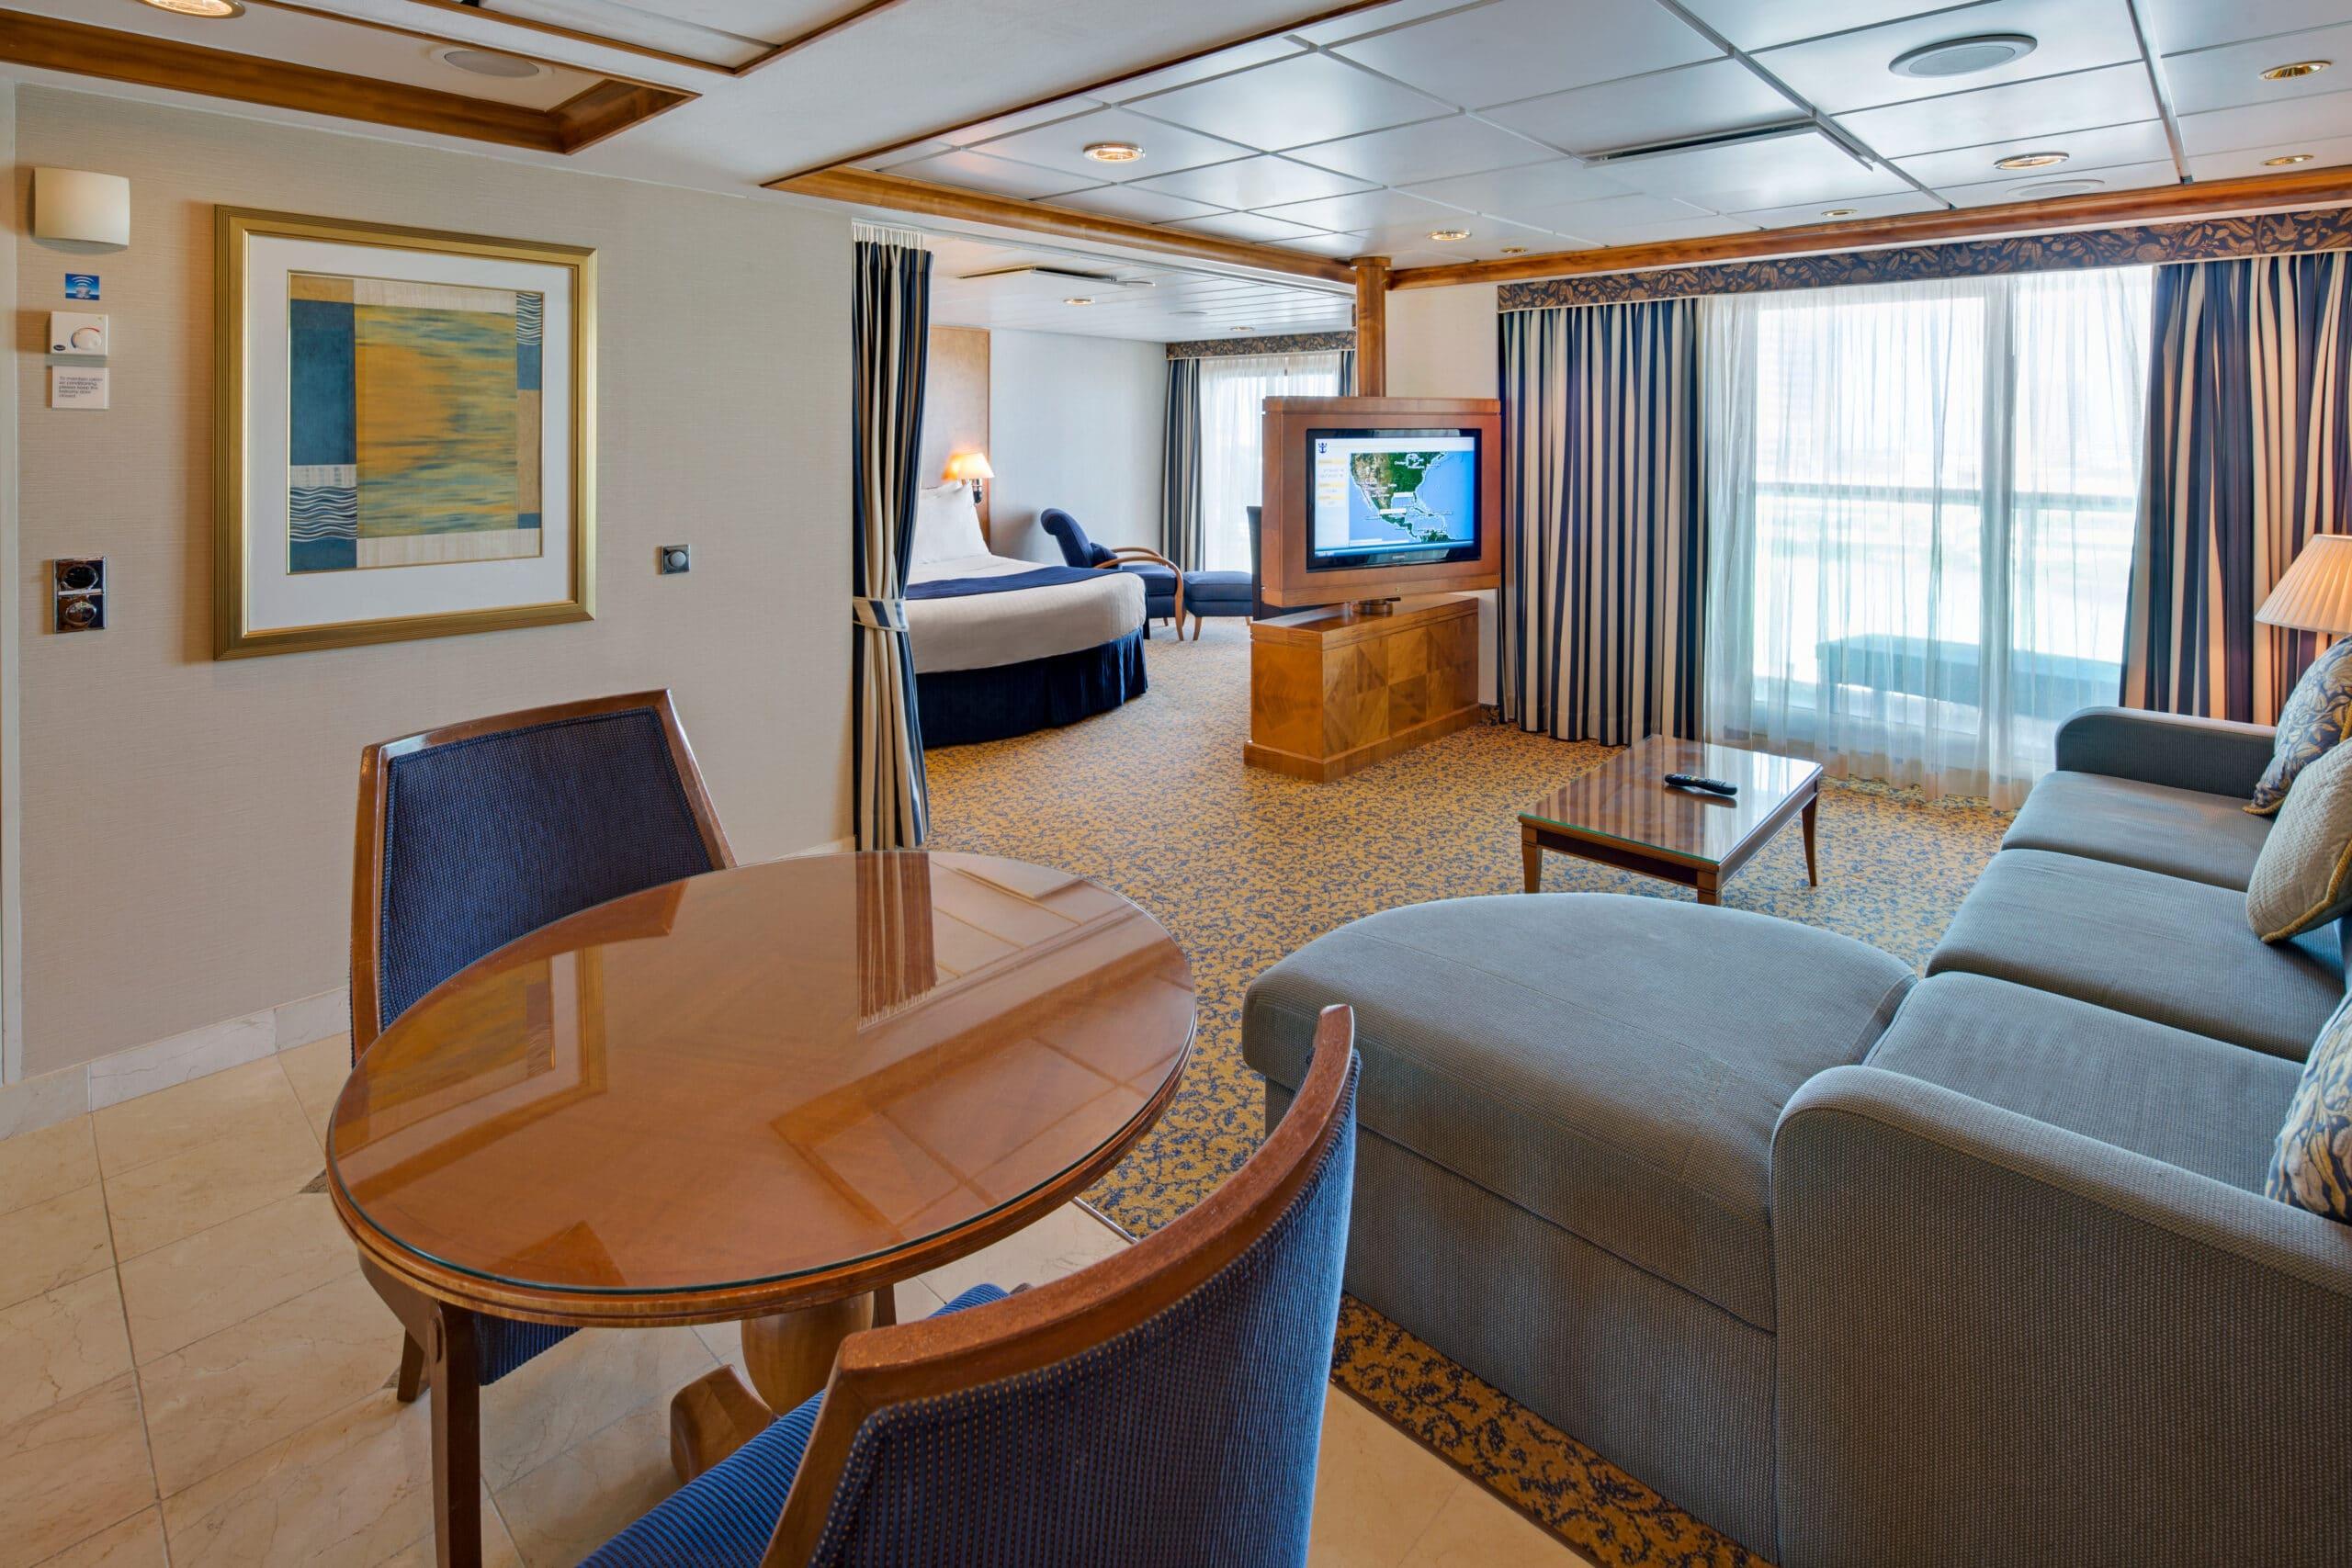 Royal-Caribbean-International-Brilliance-of-the-Seas-schip-cruiseschip-categorie-OS-Owner-Suite